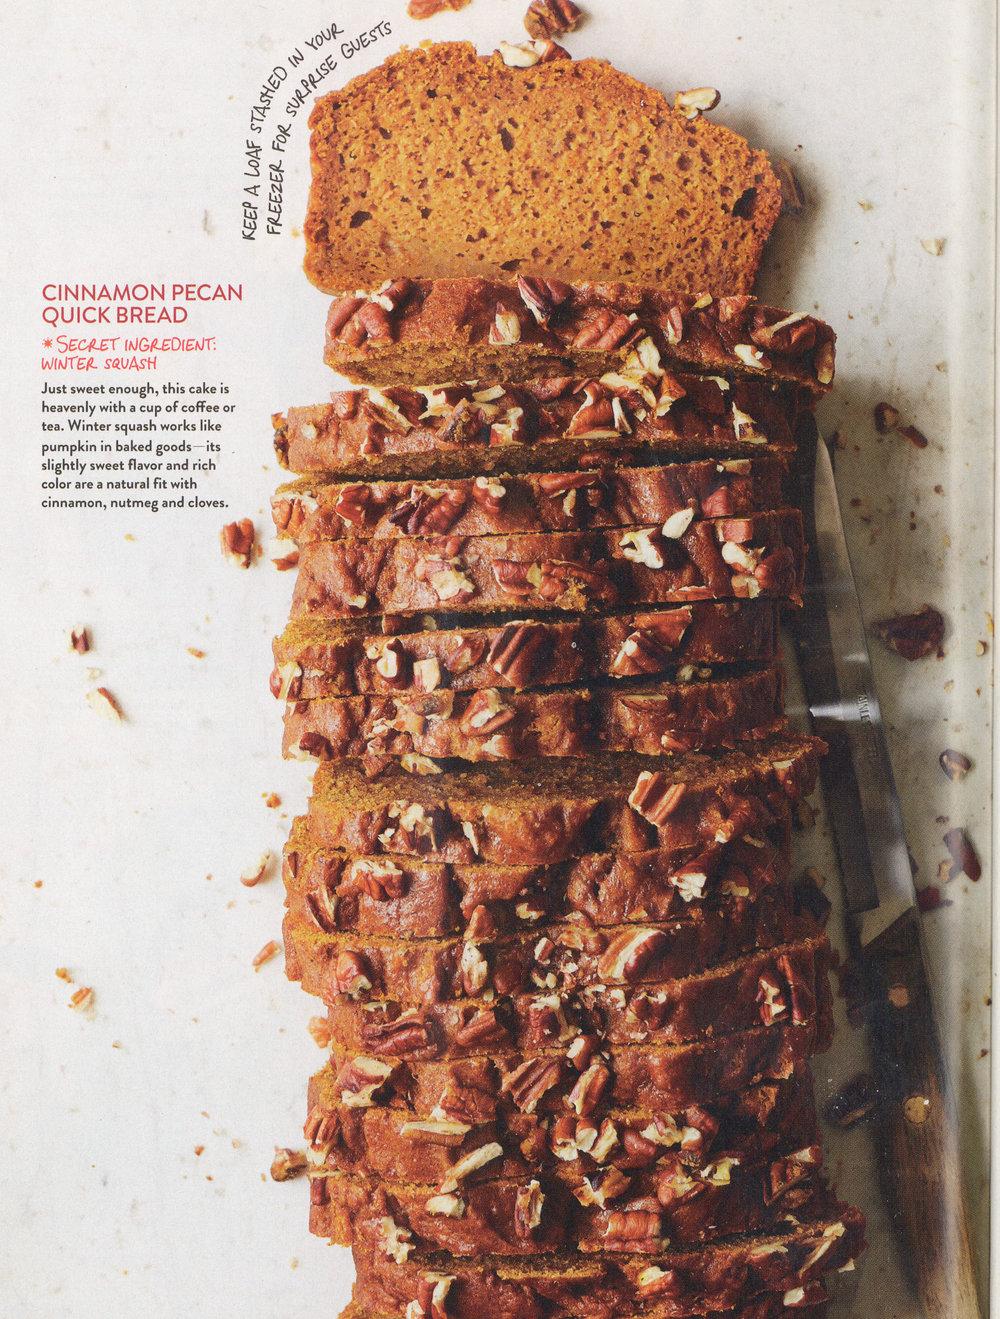 cinnamon pecan quick bread.jpg